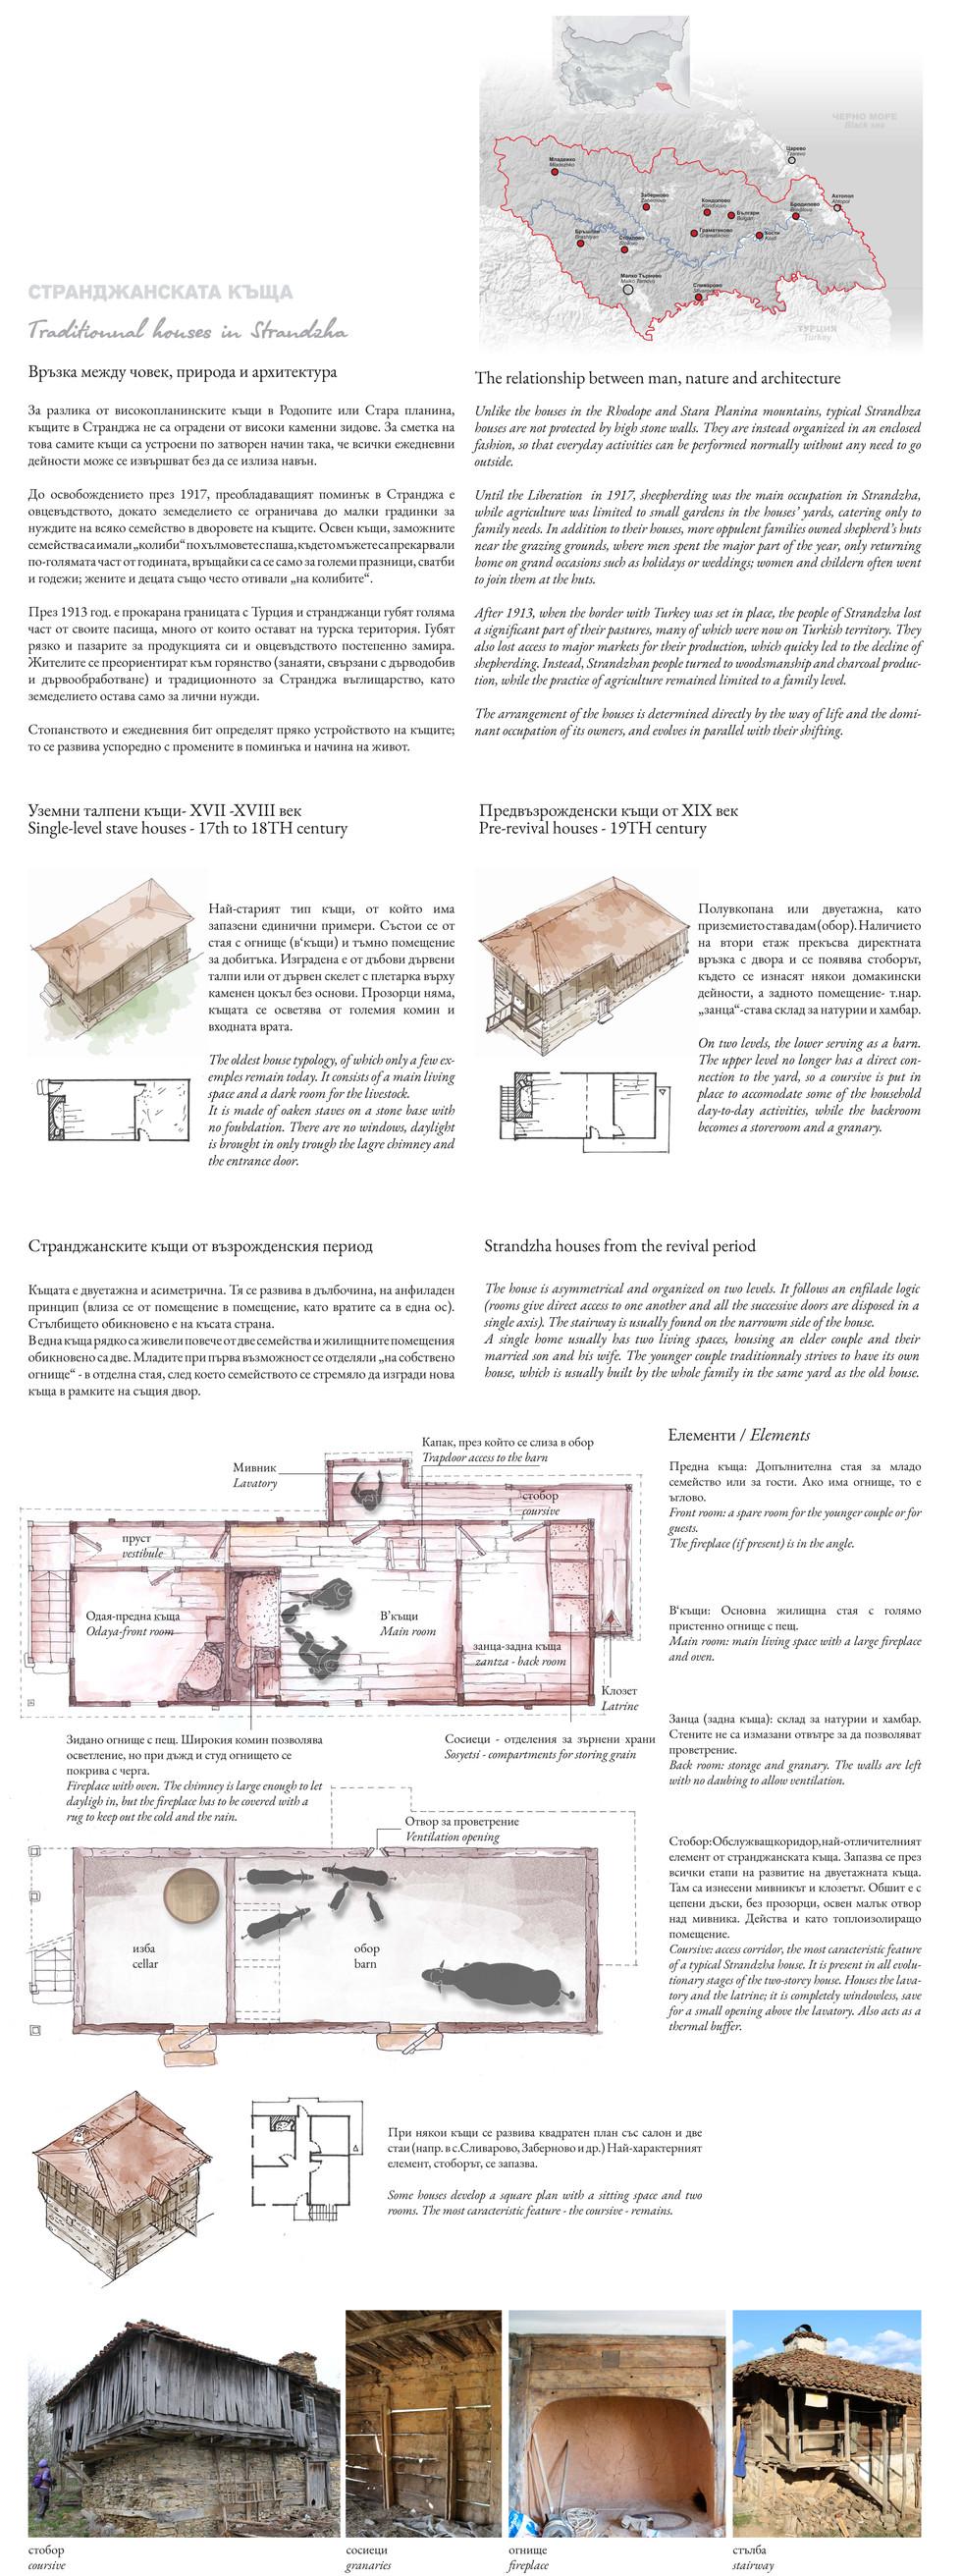 strandzha_traditional_house